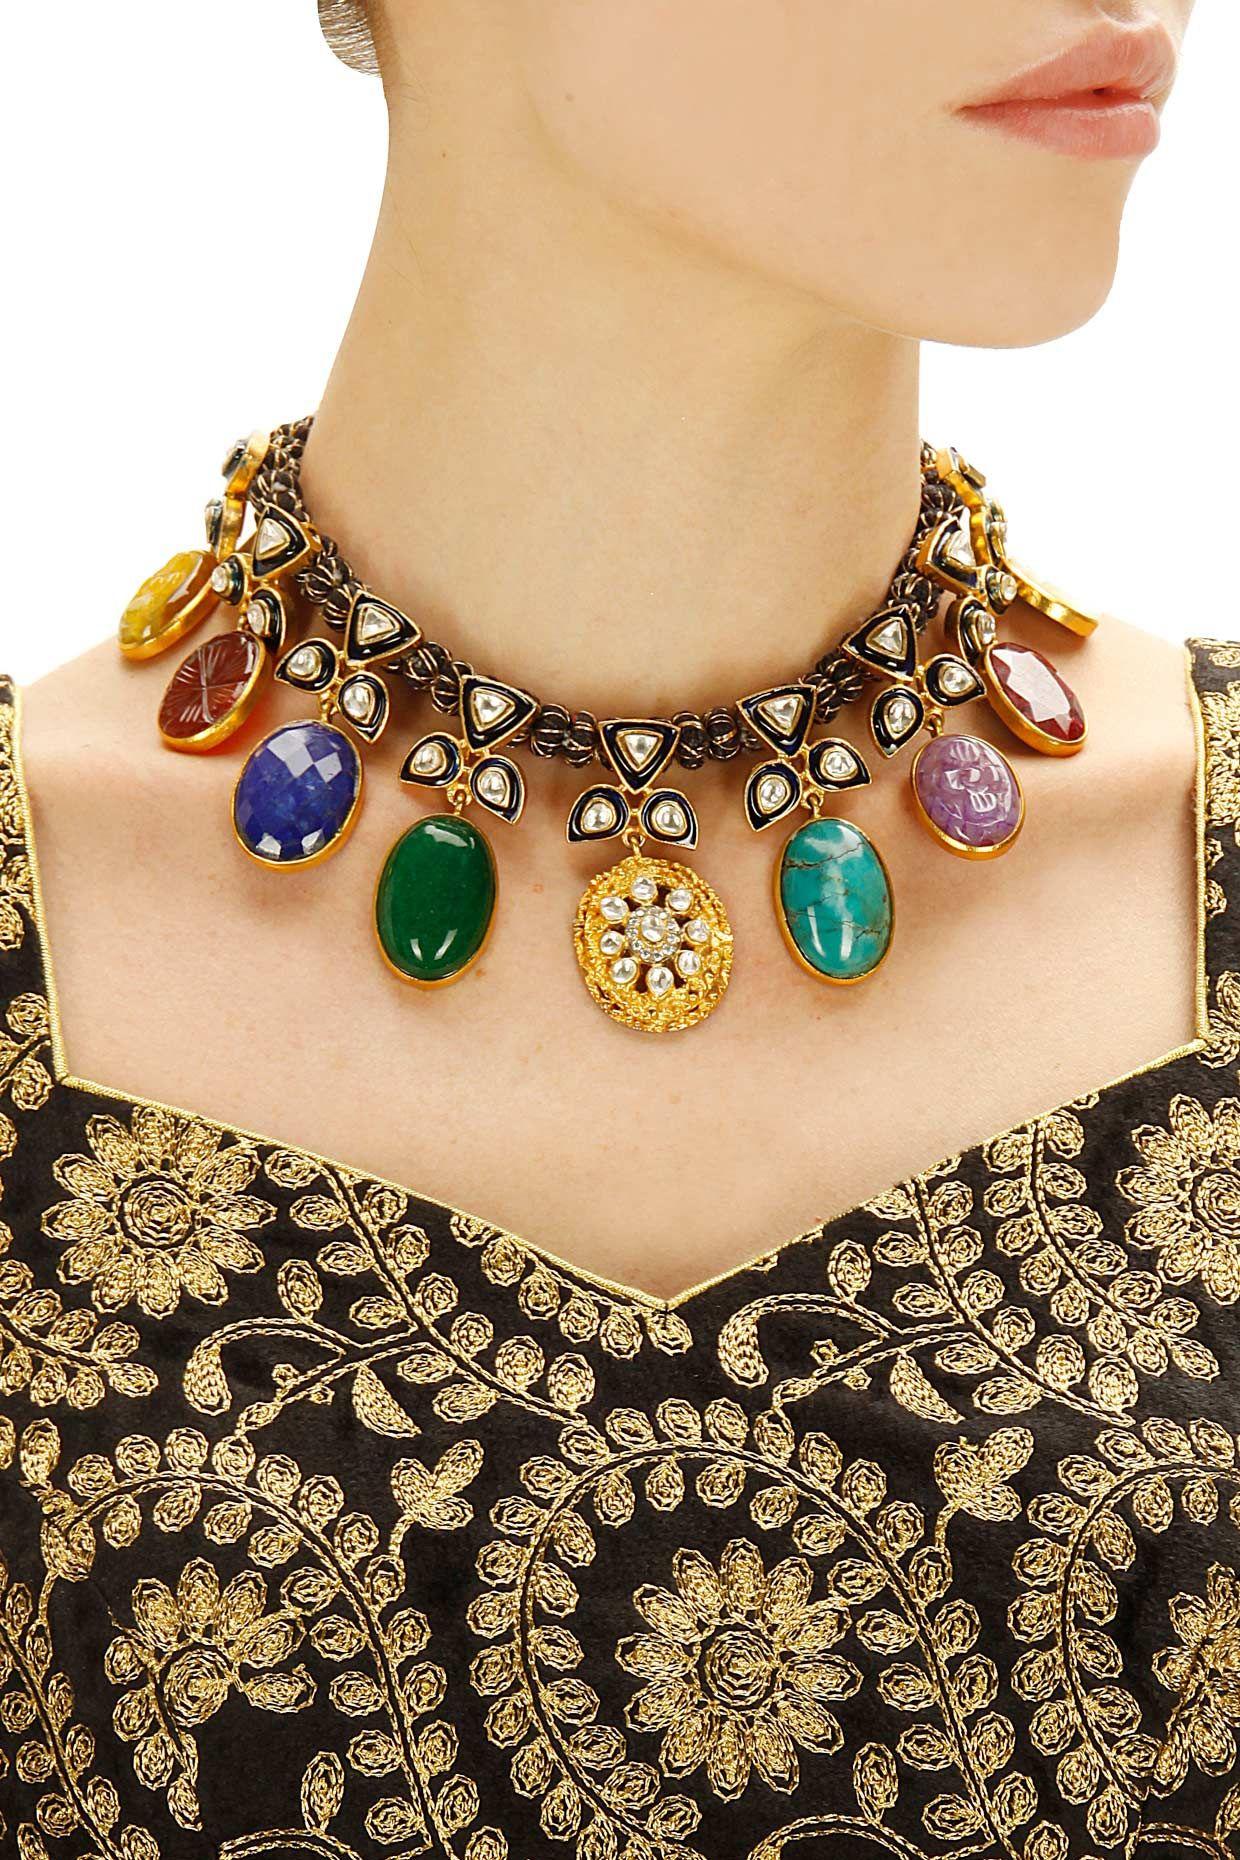 Pin by nancy pagani on jewels trinketsand beads in